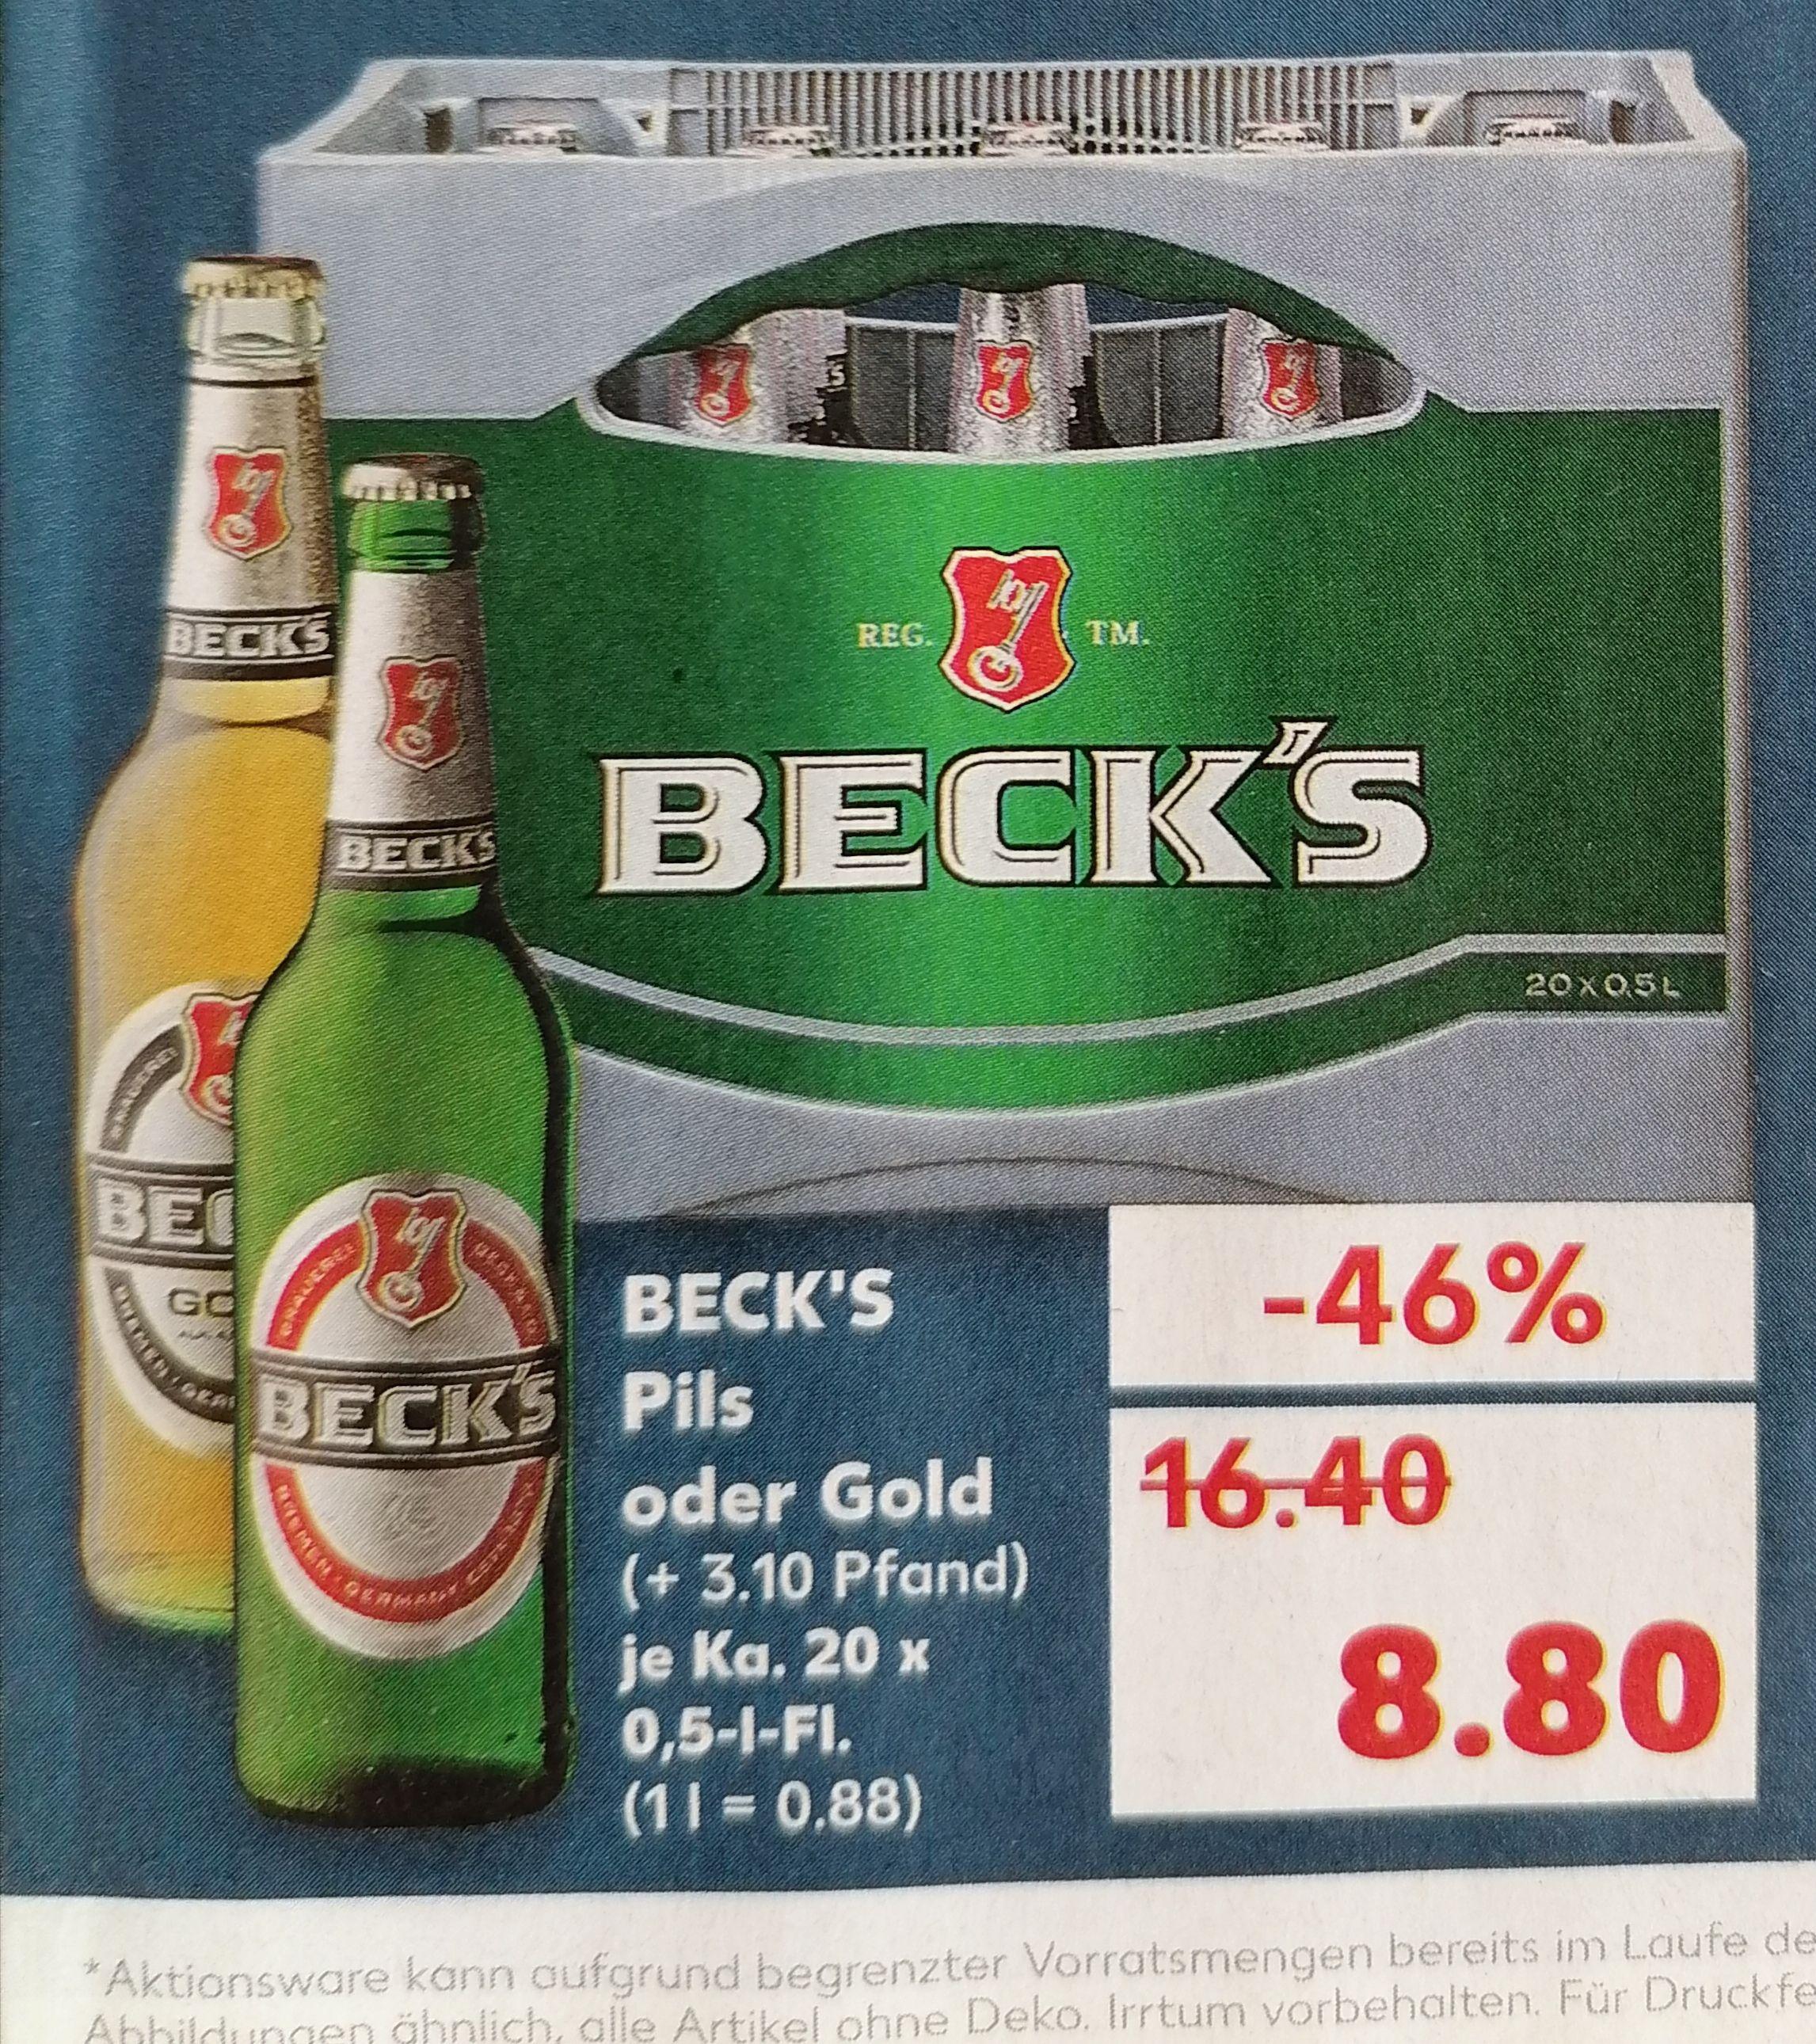 BECK'S Gold oder Pils, 20x0,5L, Bier, KAUFLAND, regional